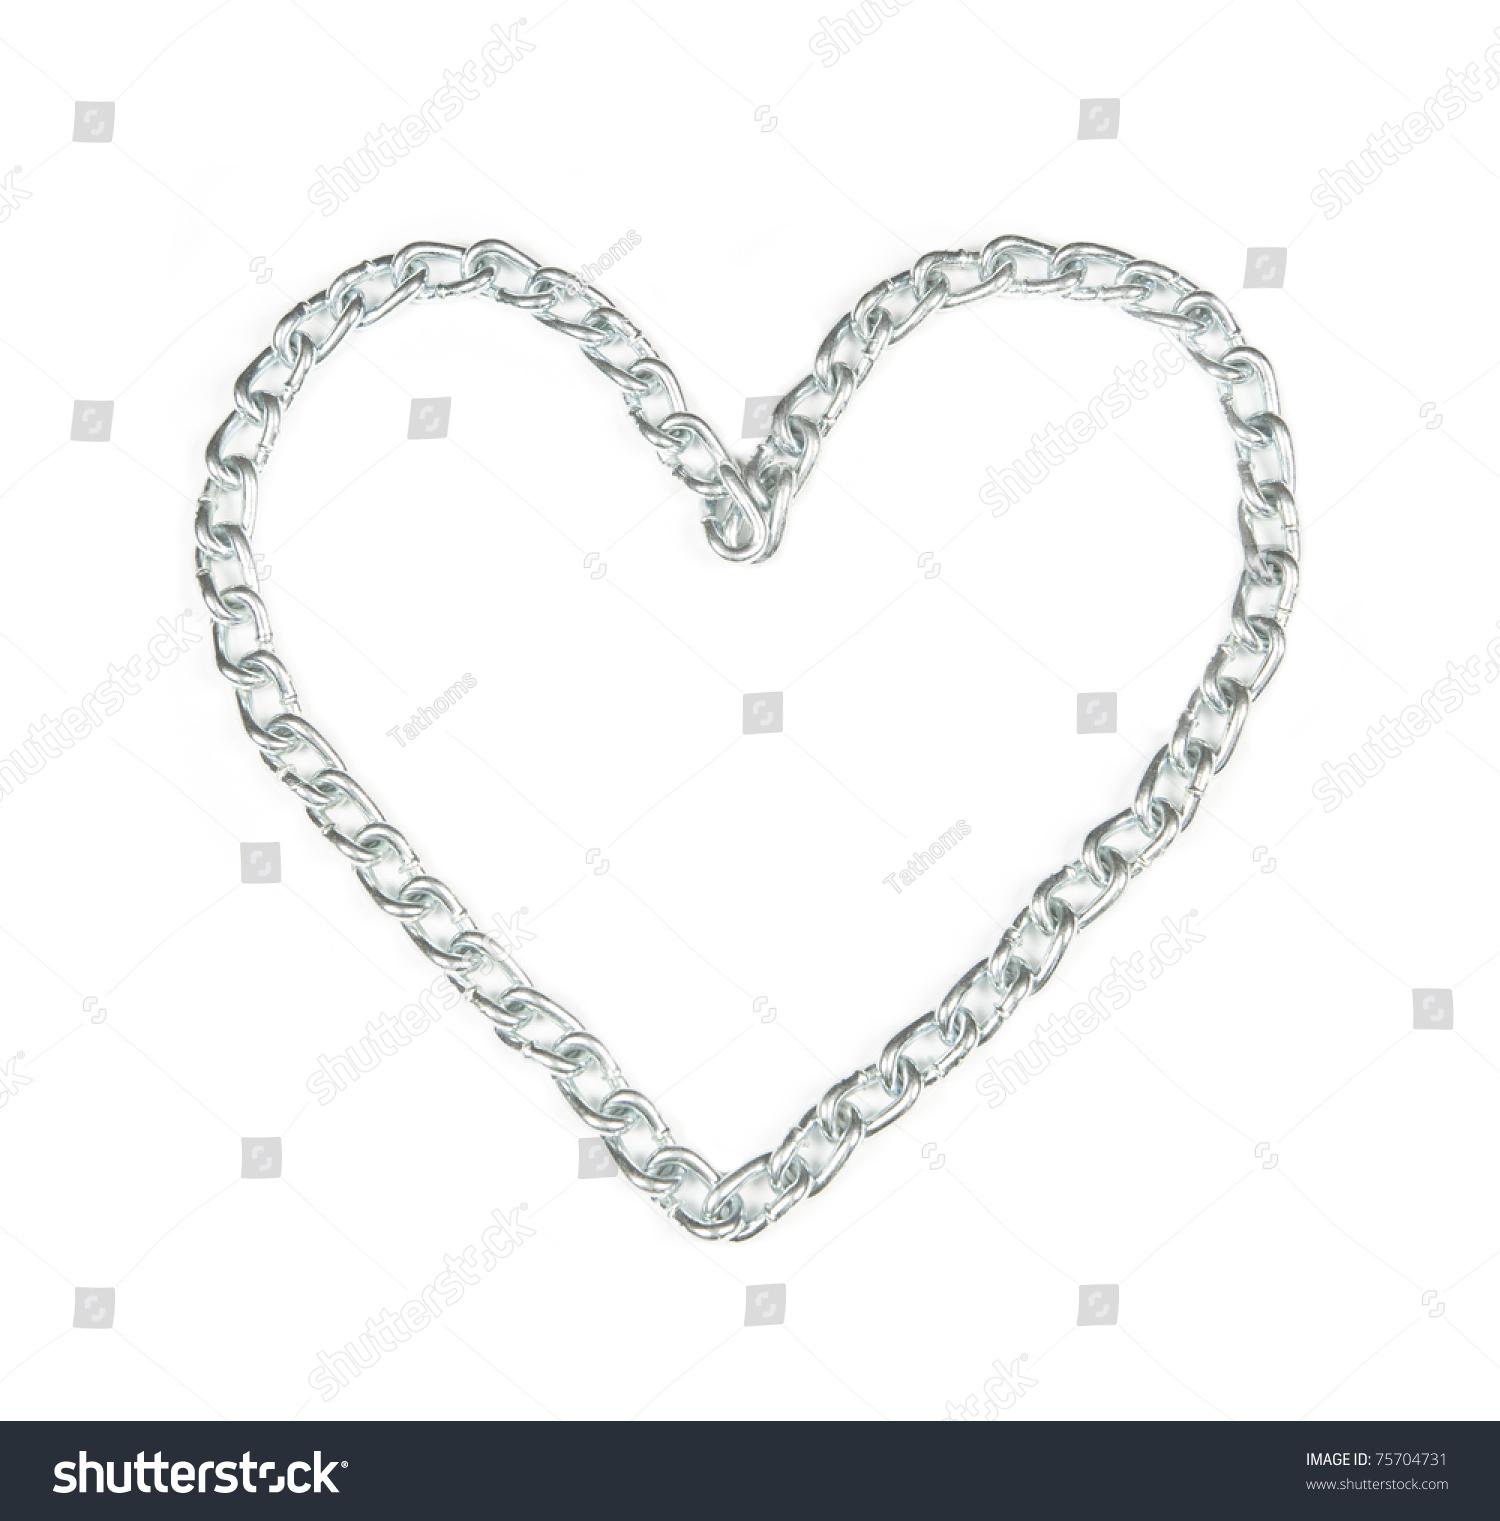 Metal chain heart